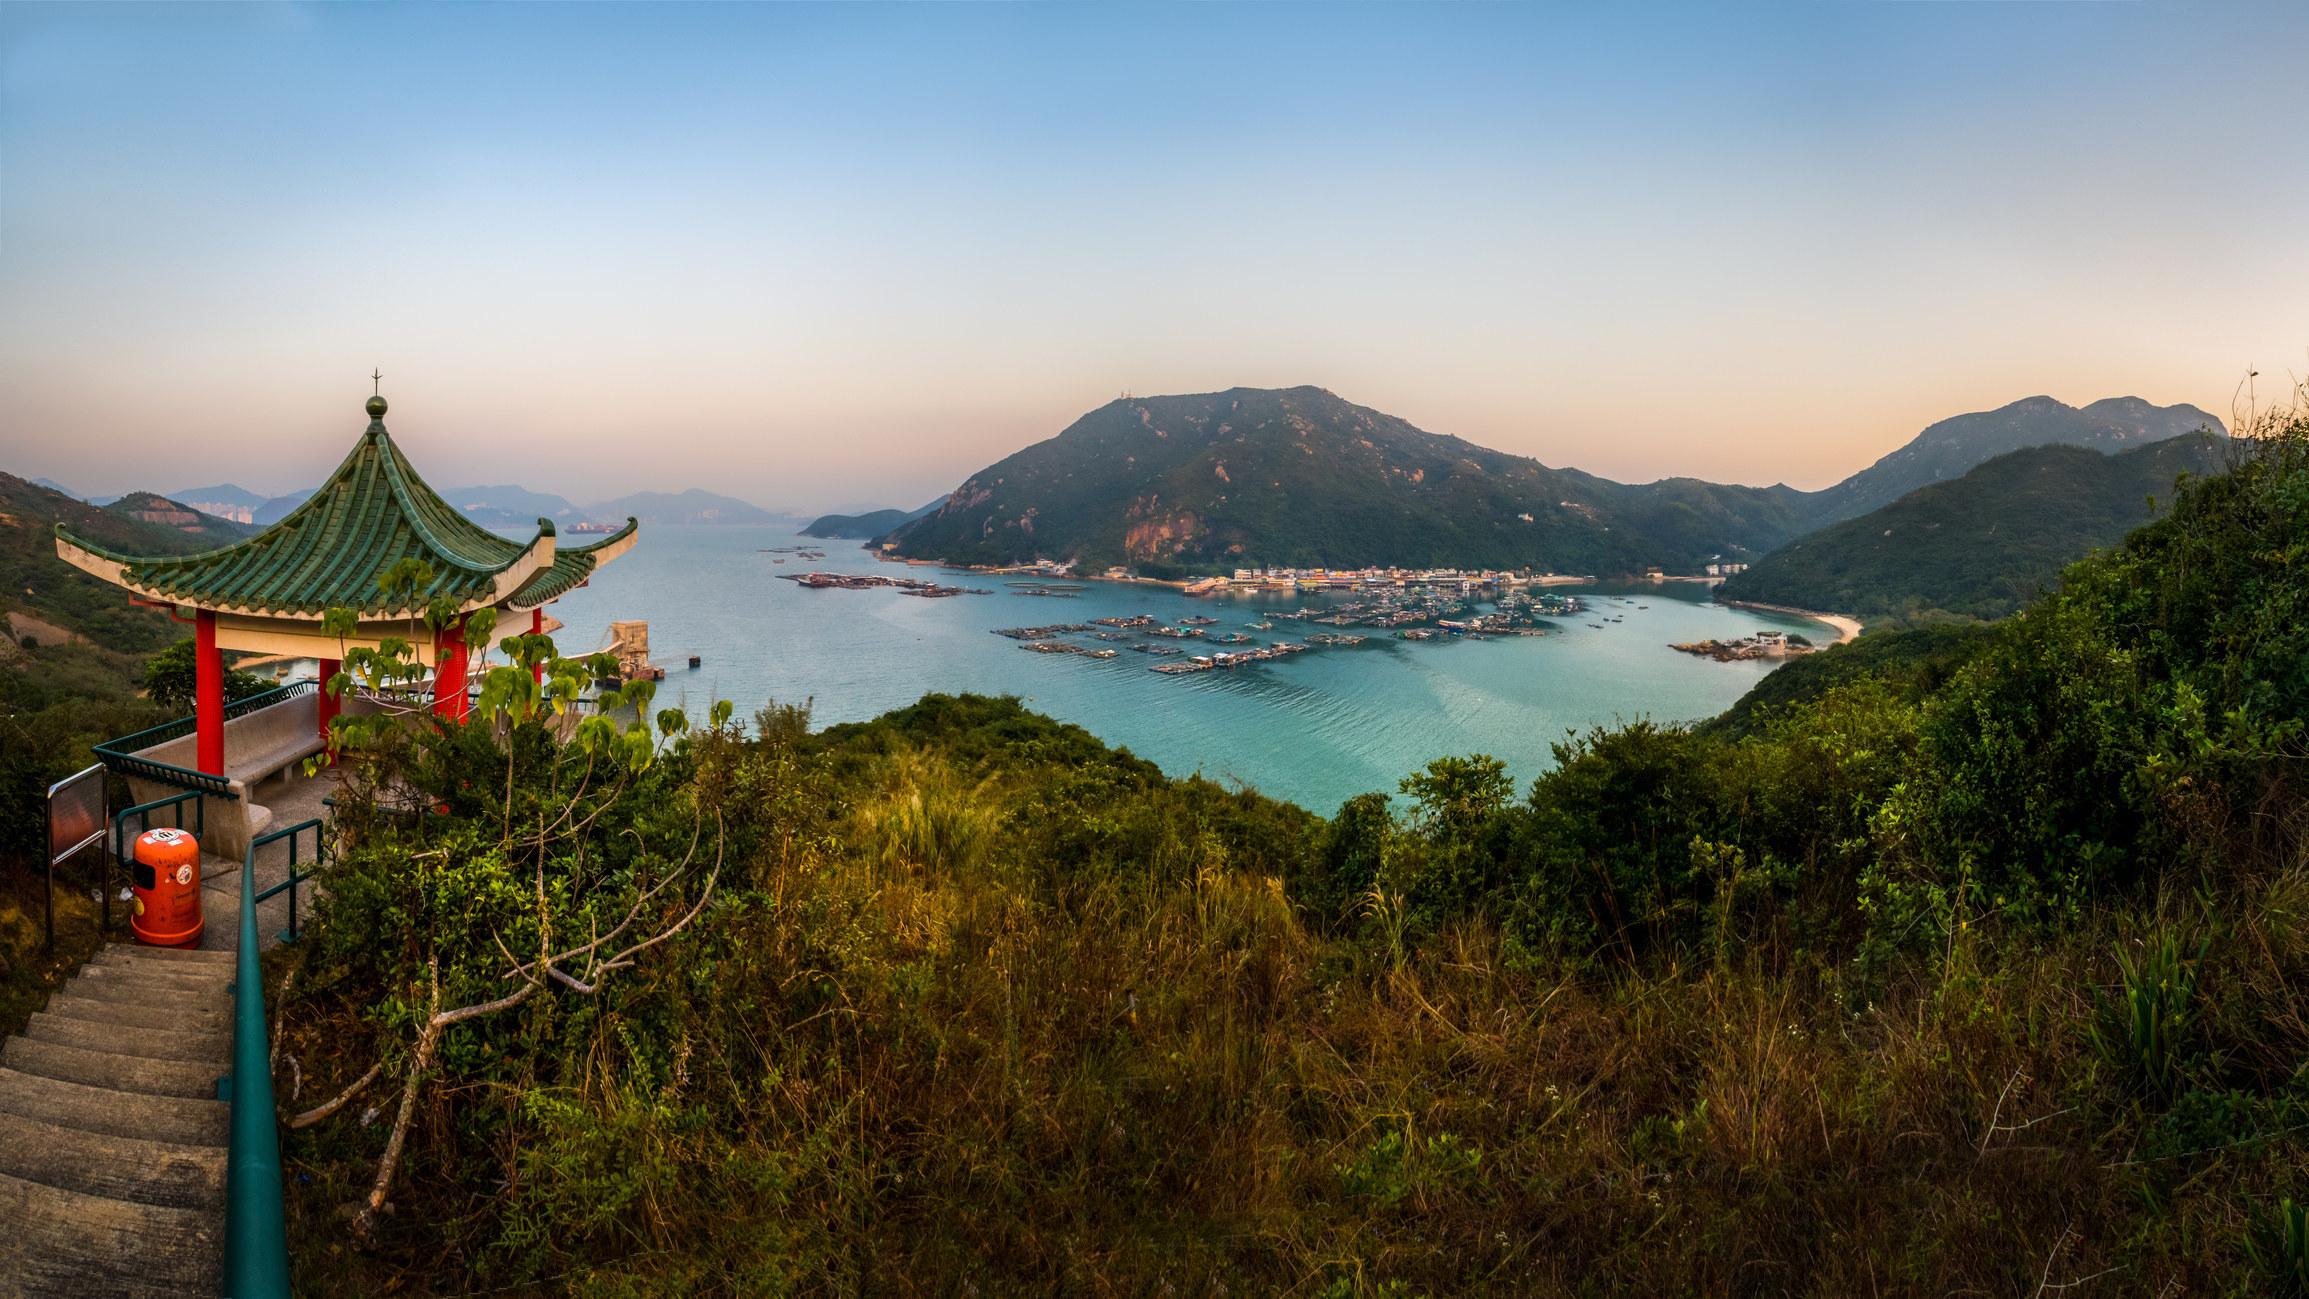 A view of Lamma Island in Hong Kong.